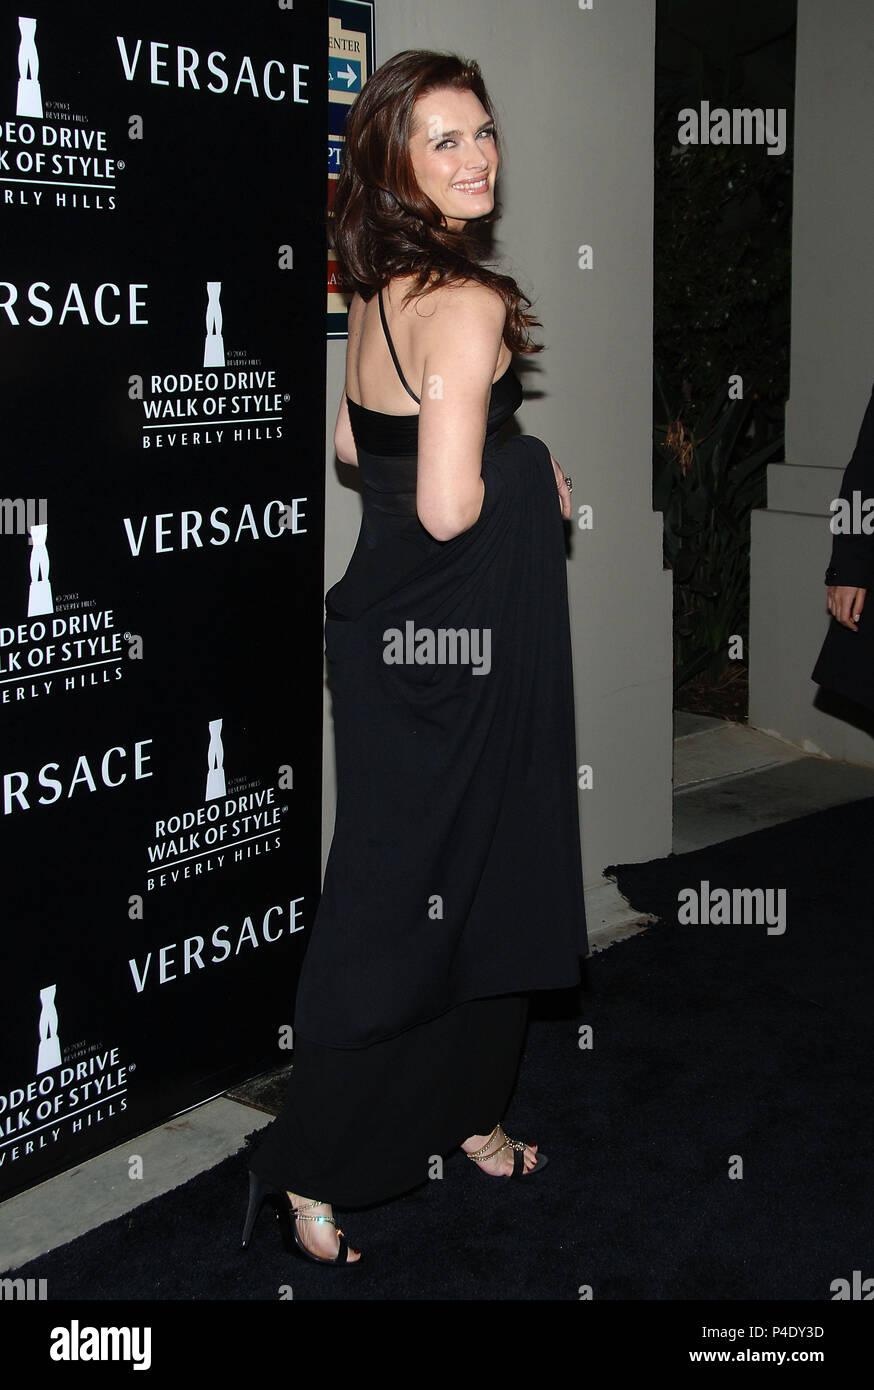 Versace Black Dress Stockfotos & Versace Black Dress Bilder - Alamy